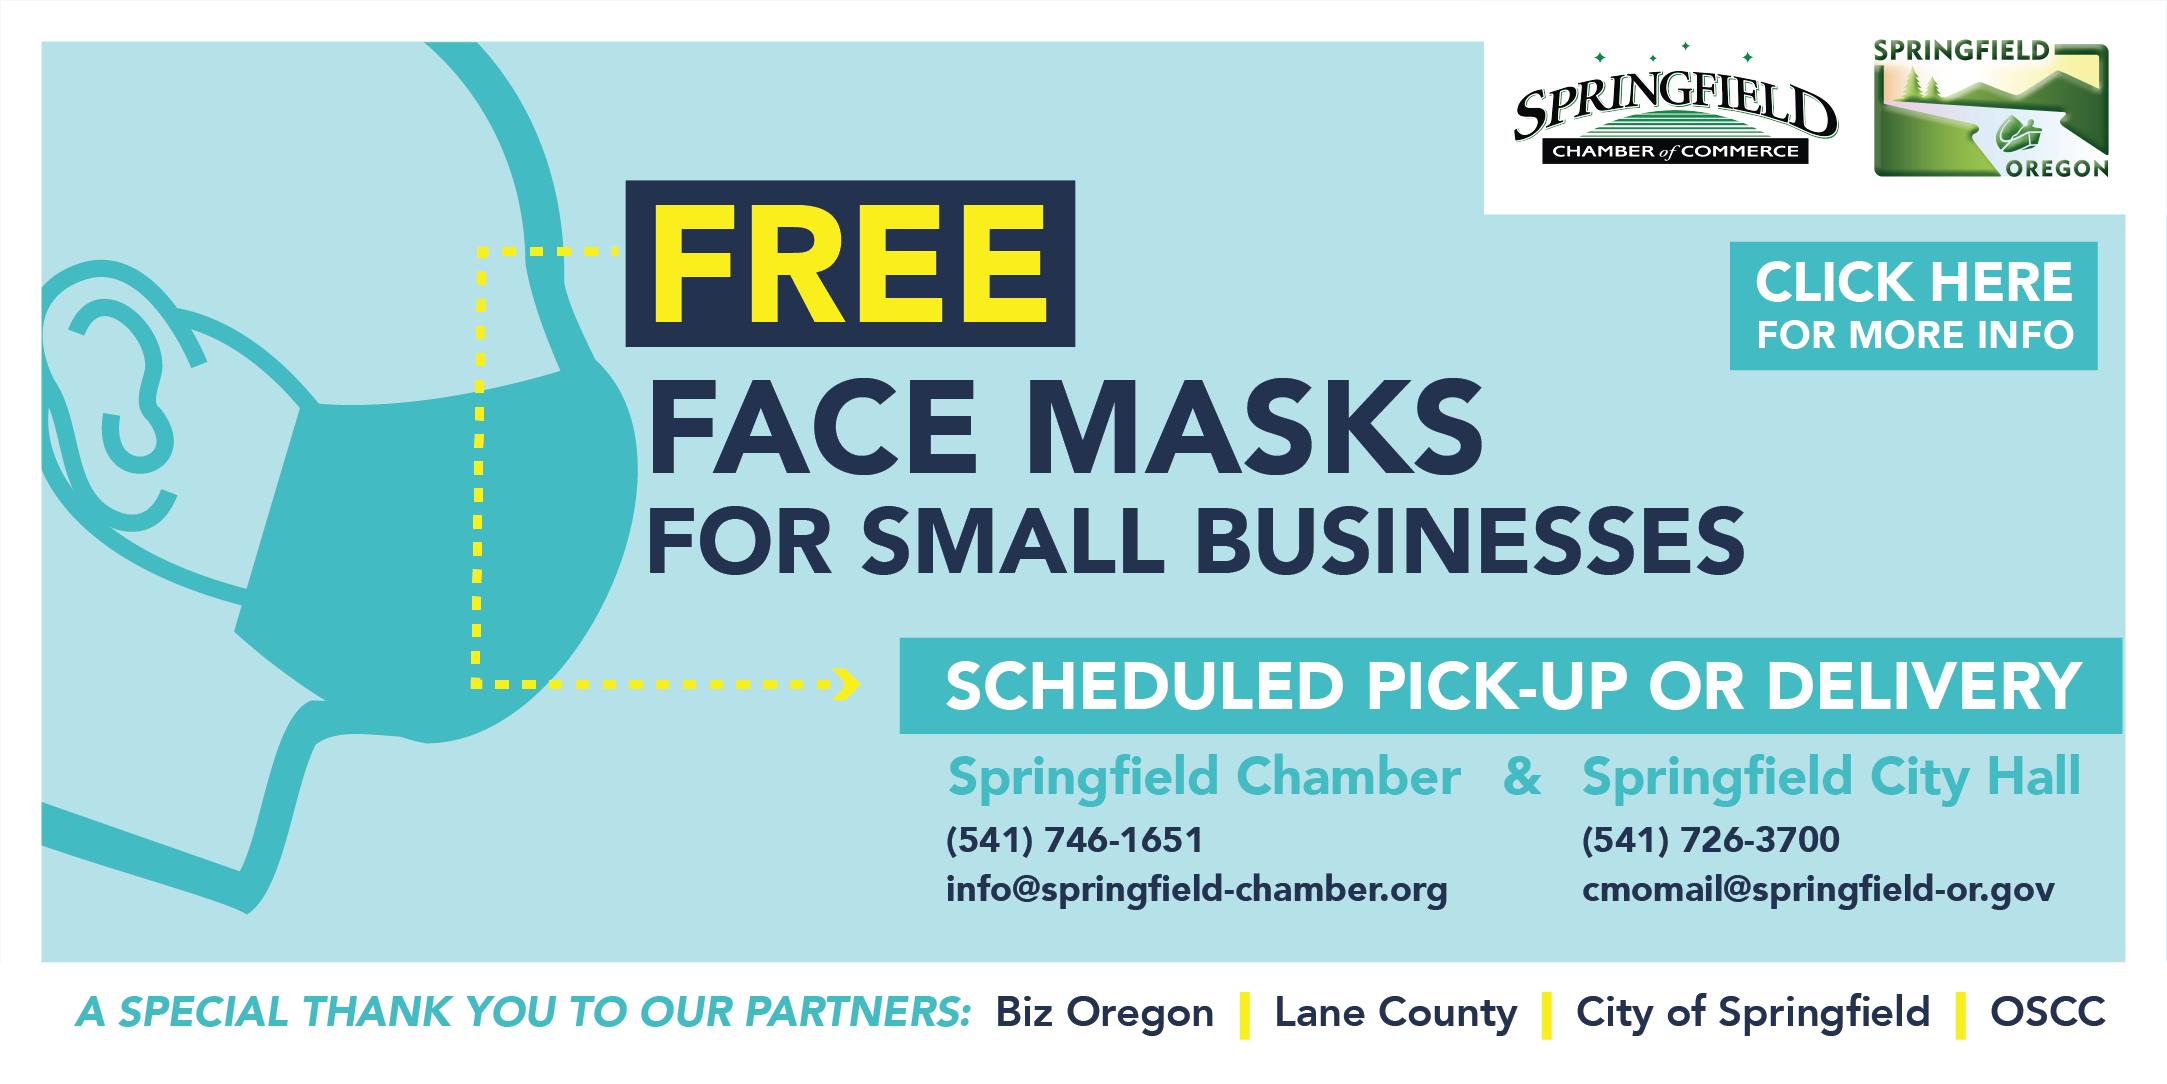 Free Face Masks Chamber/City